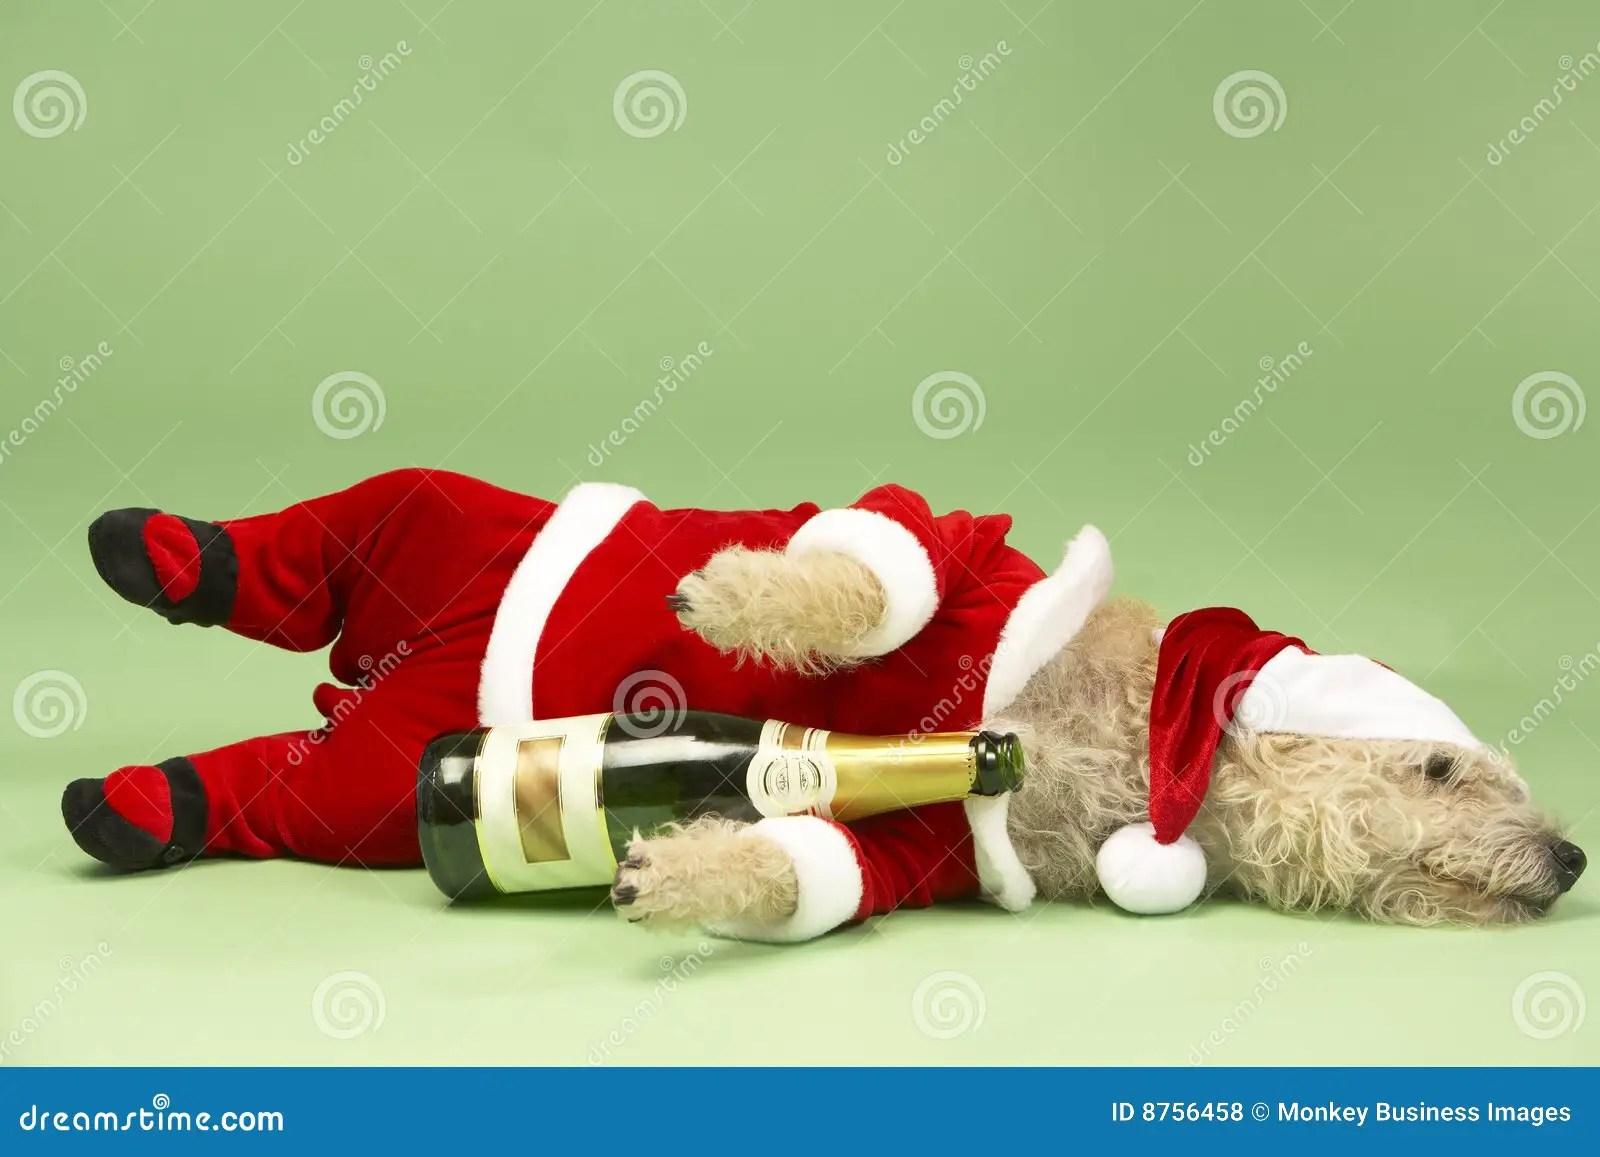 Dog In Santa Costume Stock Photo Image Of Drinking Funny